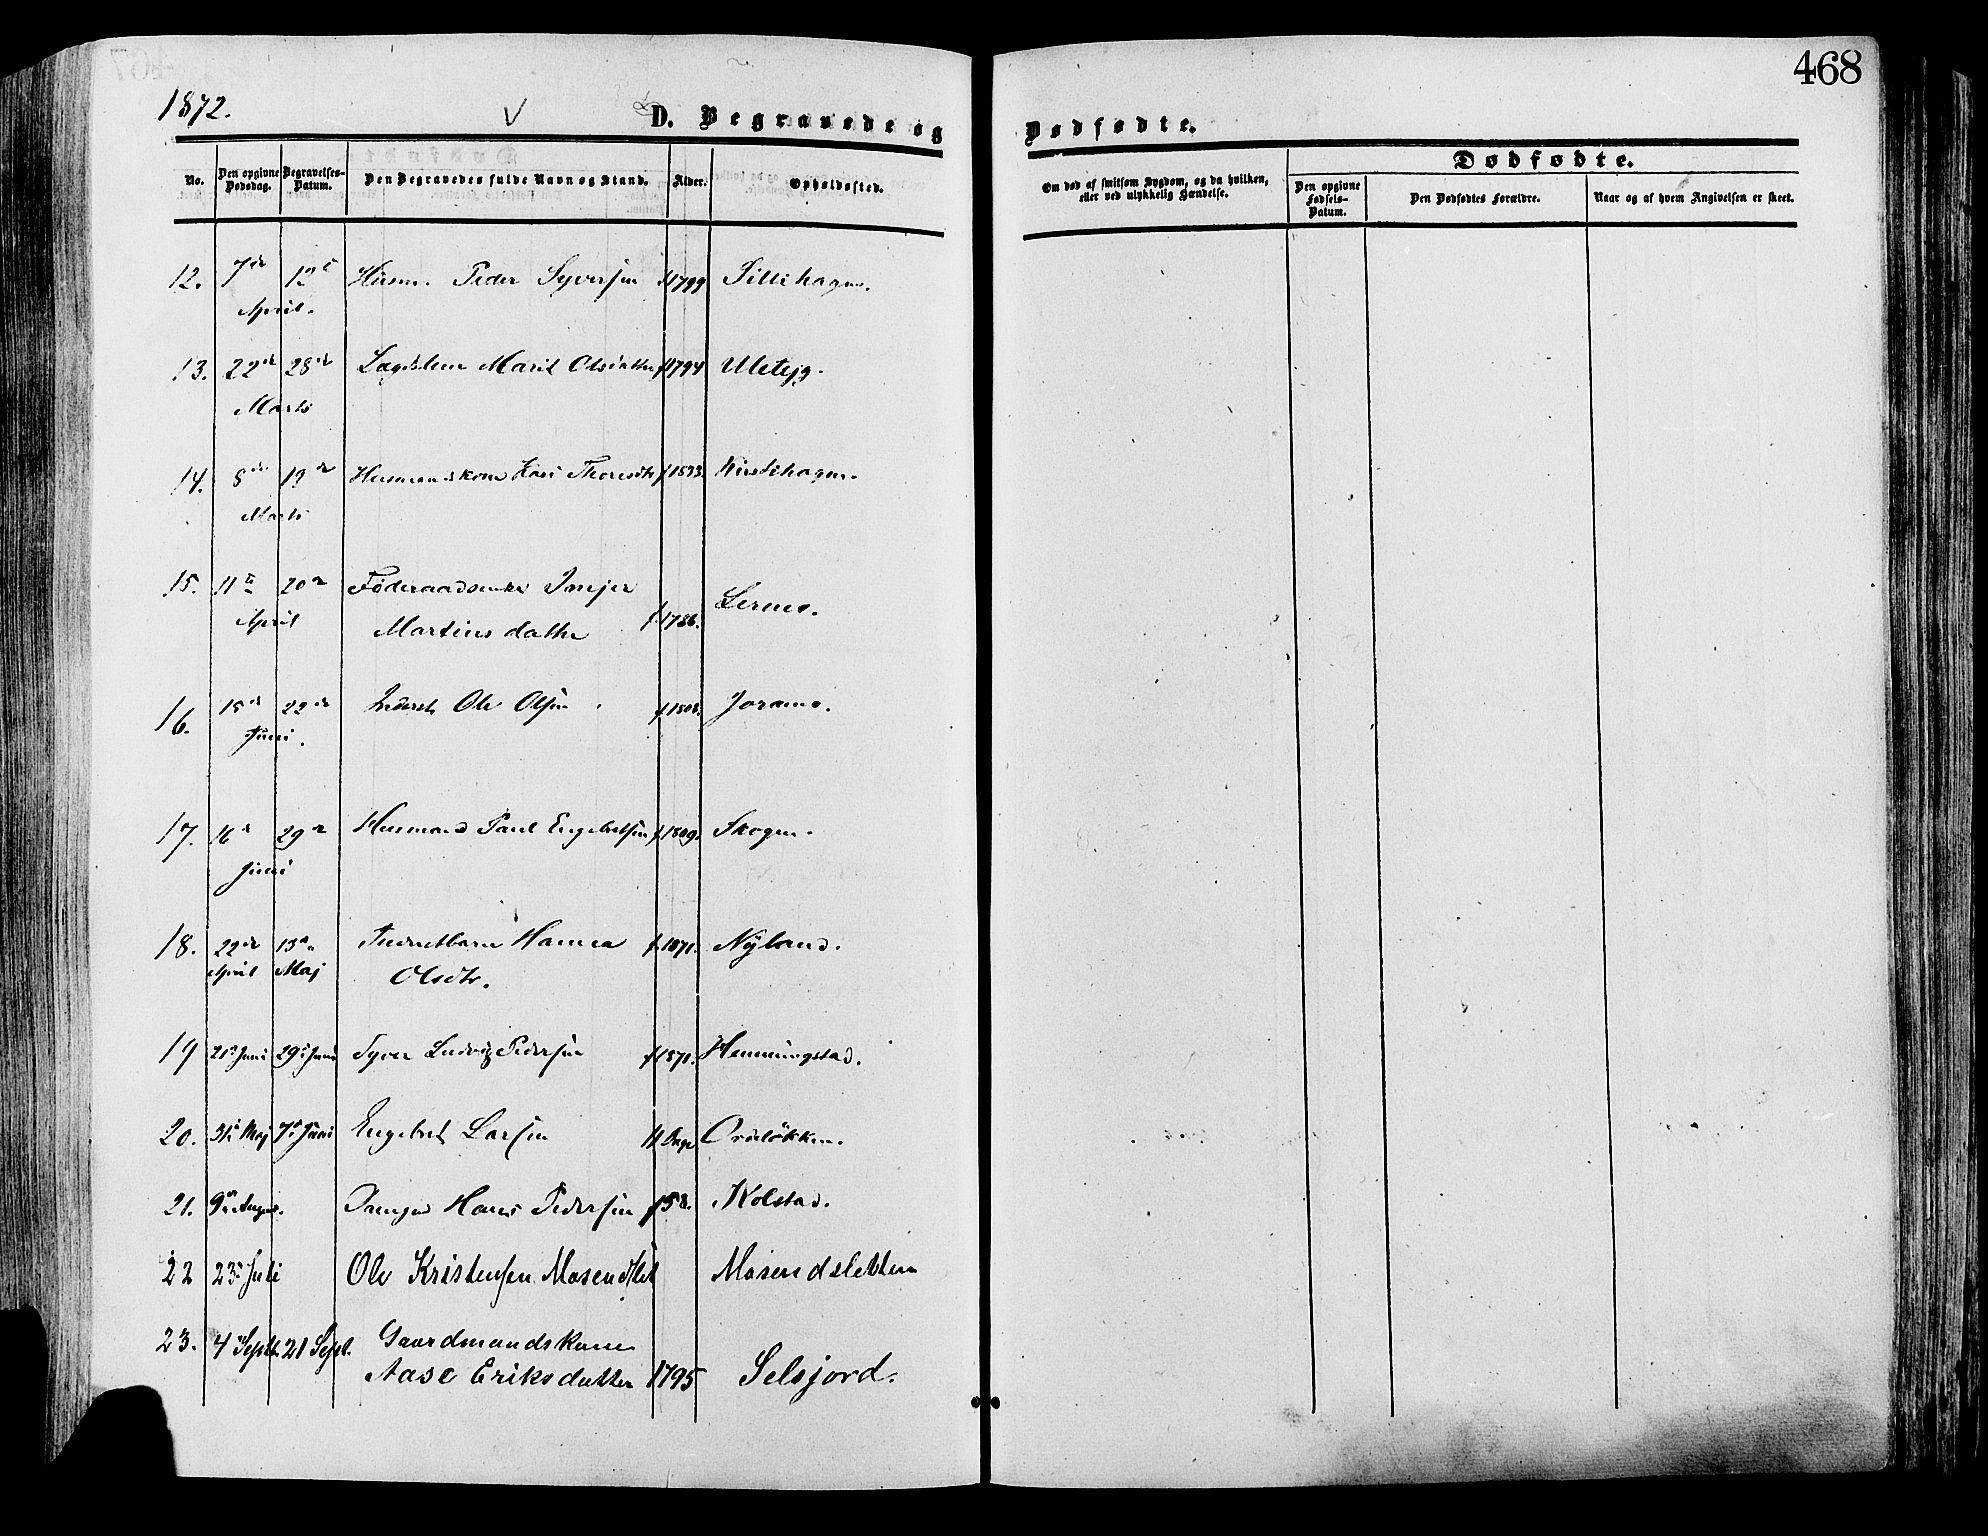 SAH, Lesja prestekontor, Ministerialbok nr. 8, 1854-1880, s. 468